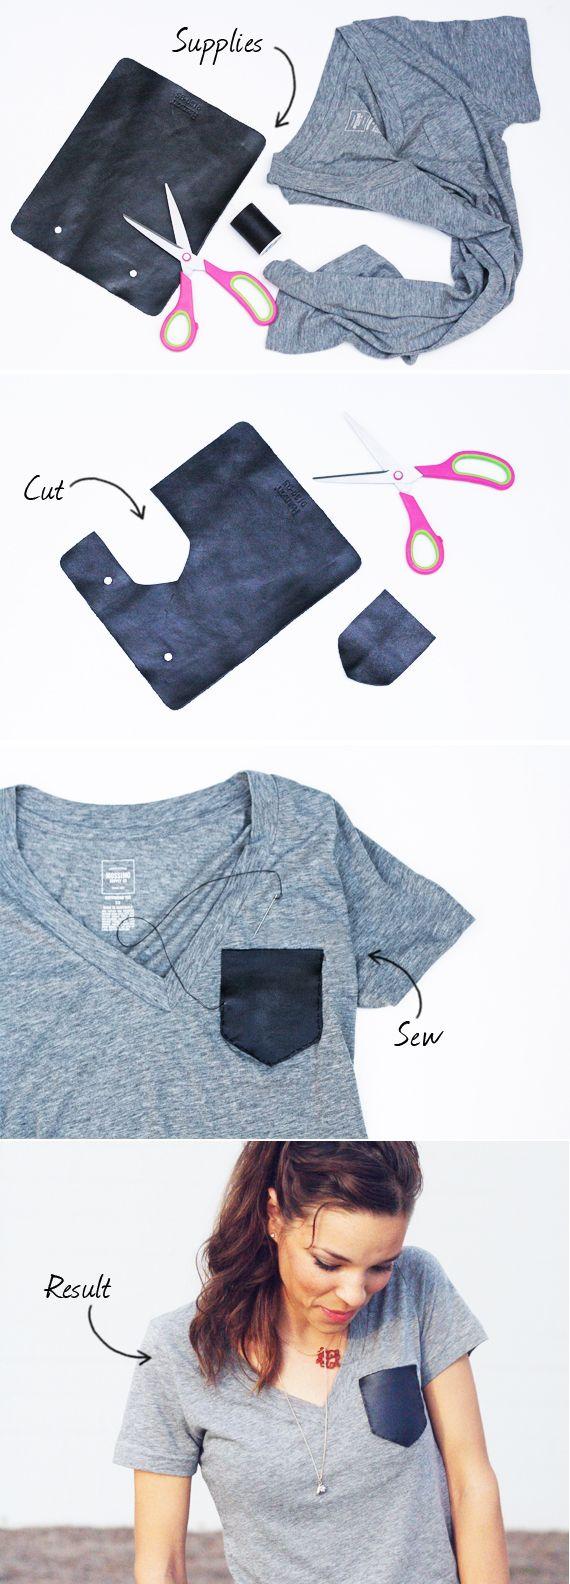 A Leather Pocket